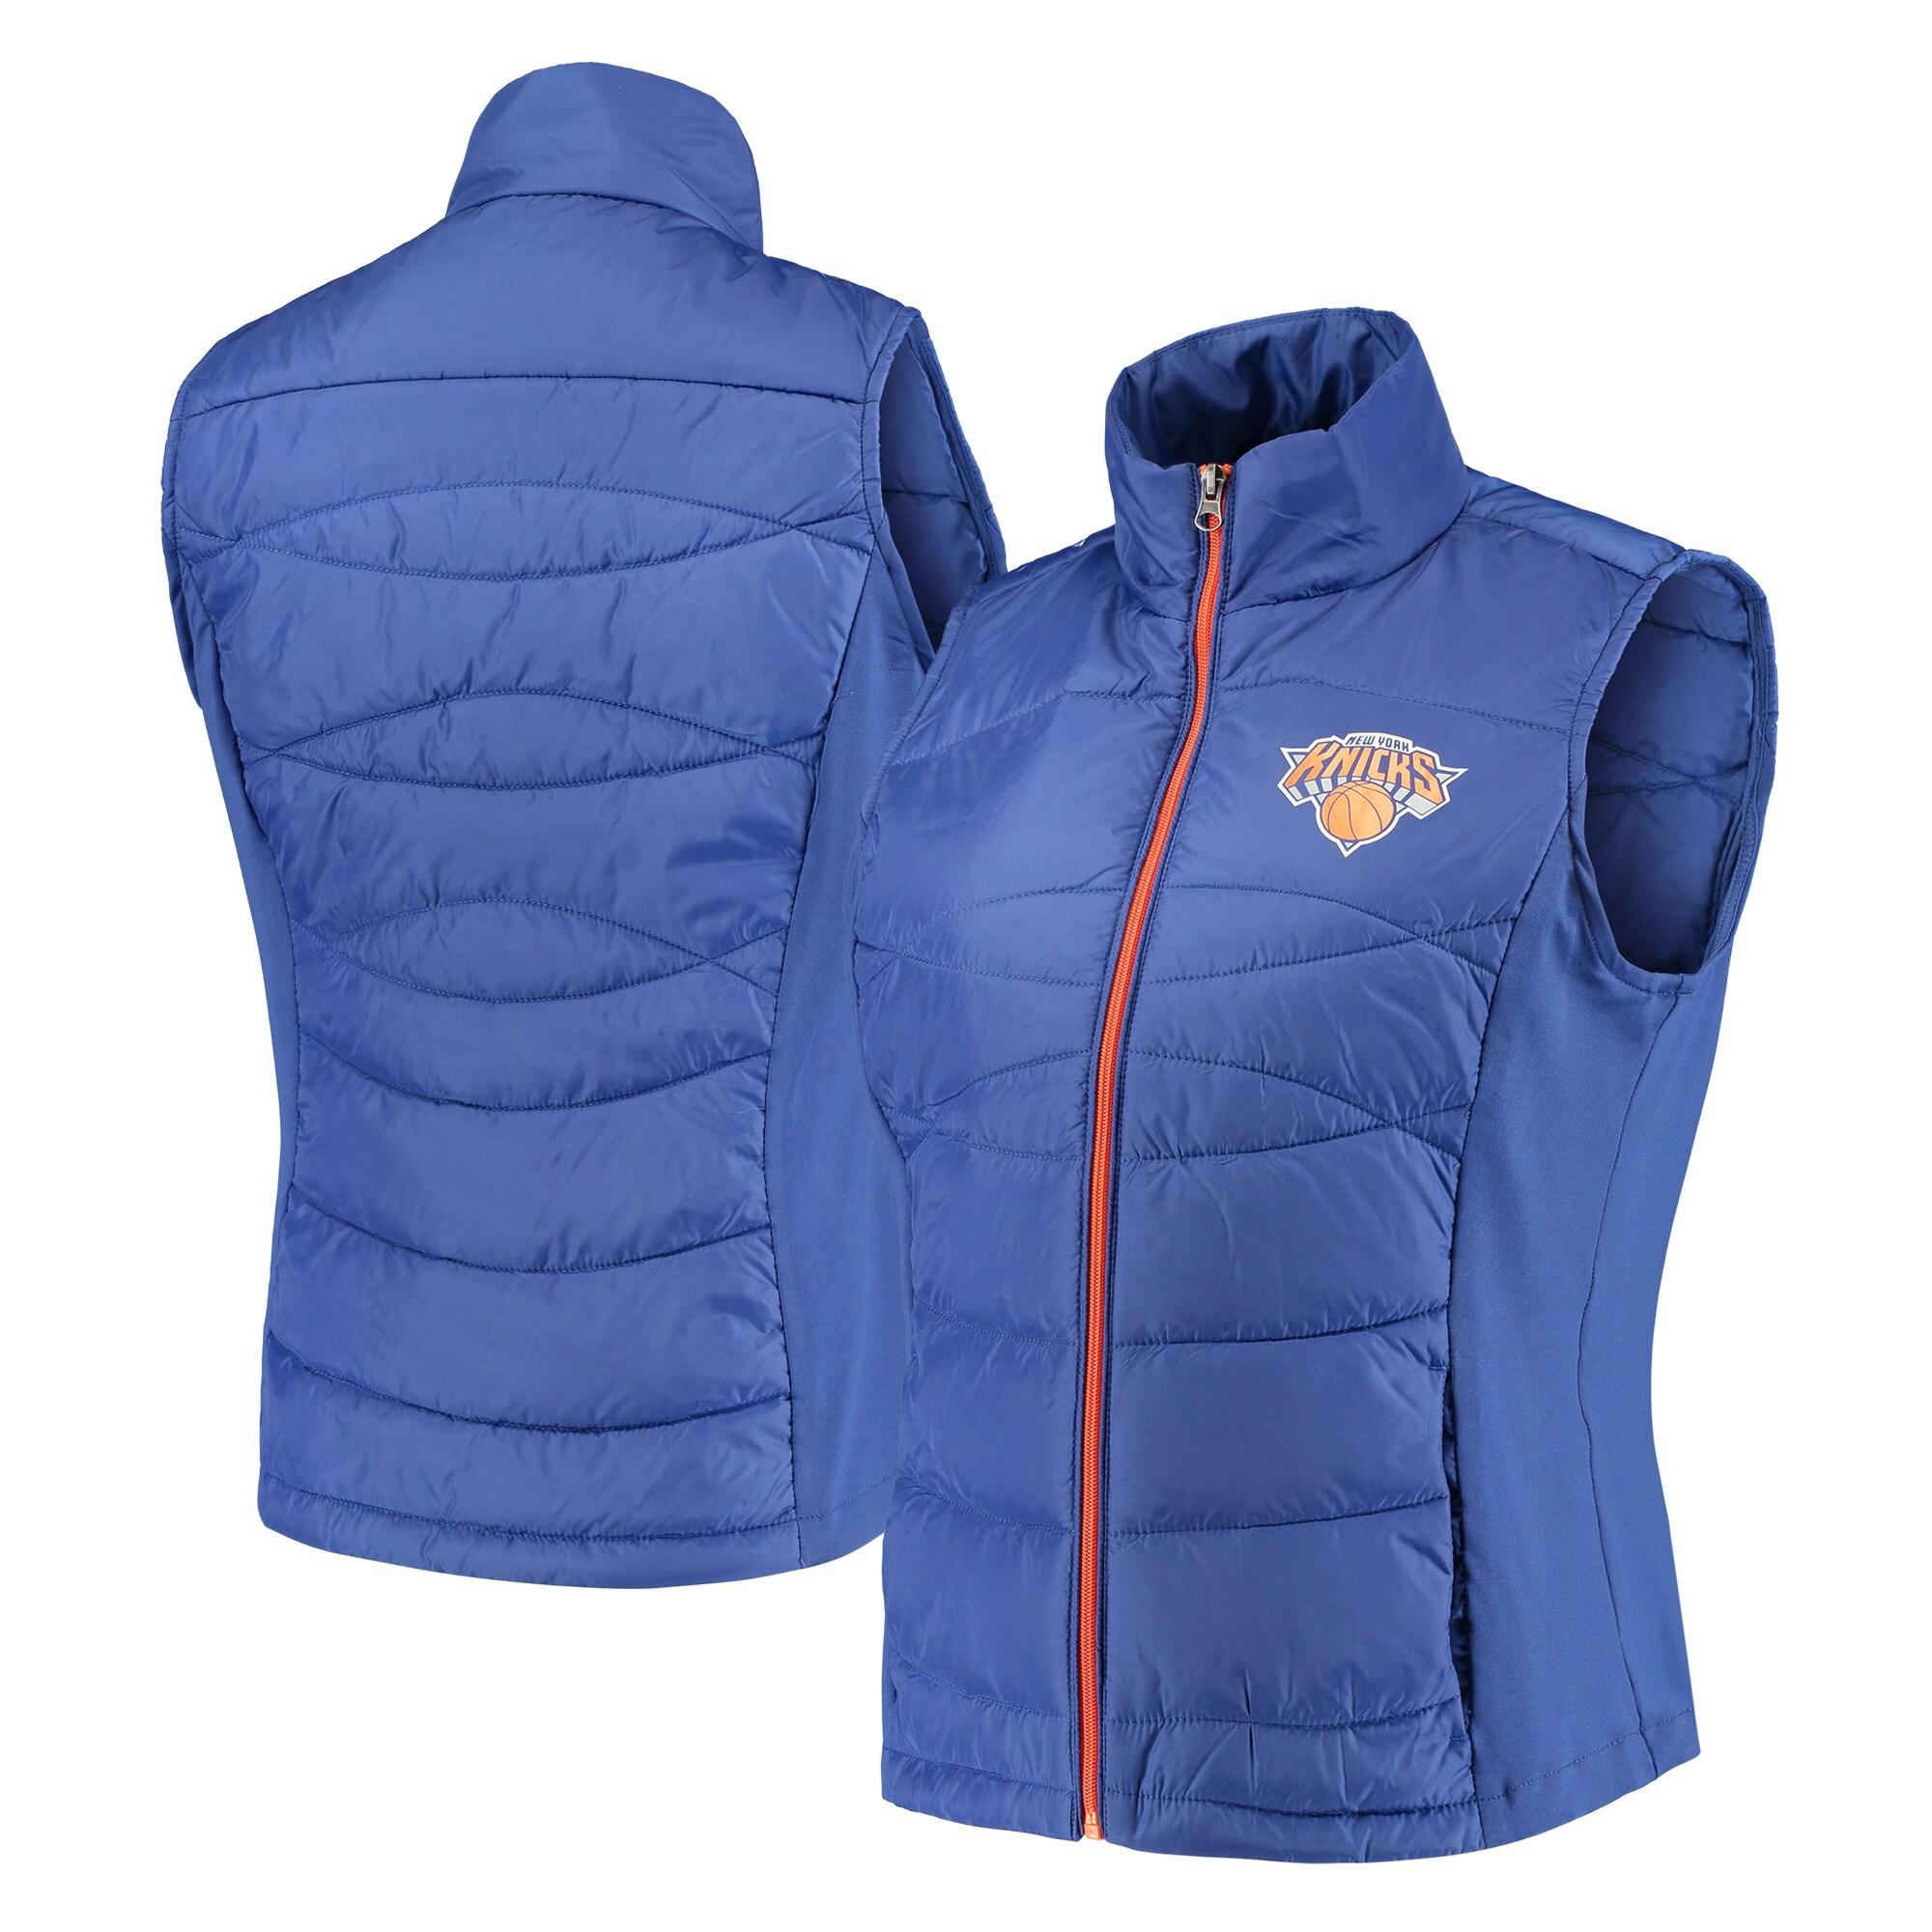 New York Knicks G-III 4Her by Carl Banks Women's Wing Back Lightweight Polyfill Vest - Blue